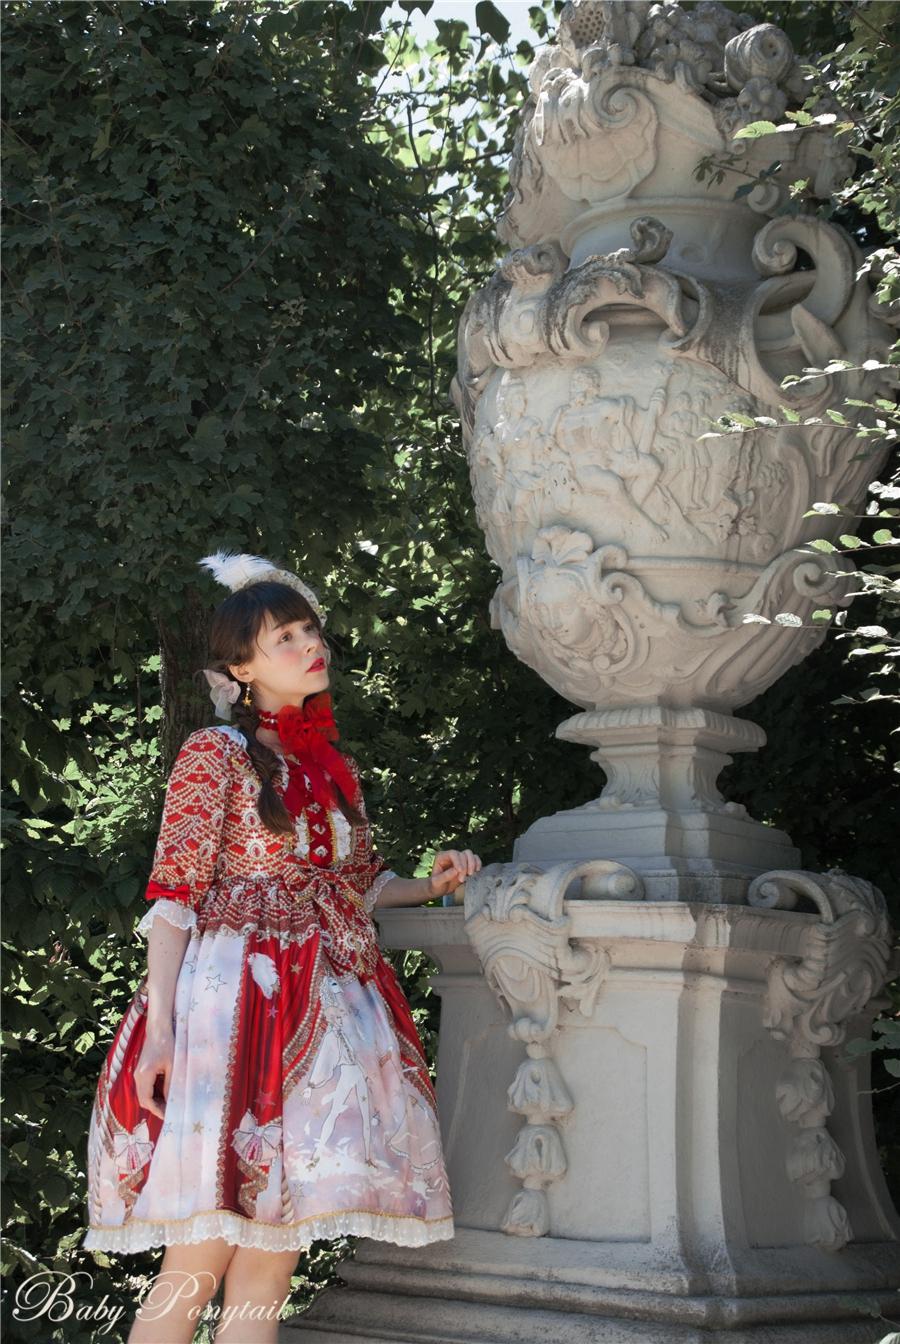 Baby Ponytail Masquerade Ballet Red OP_Claudia_05.jpg